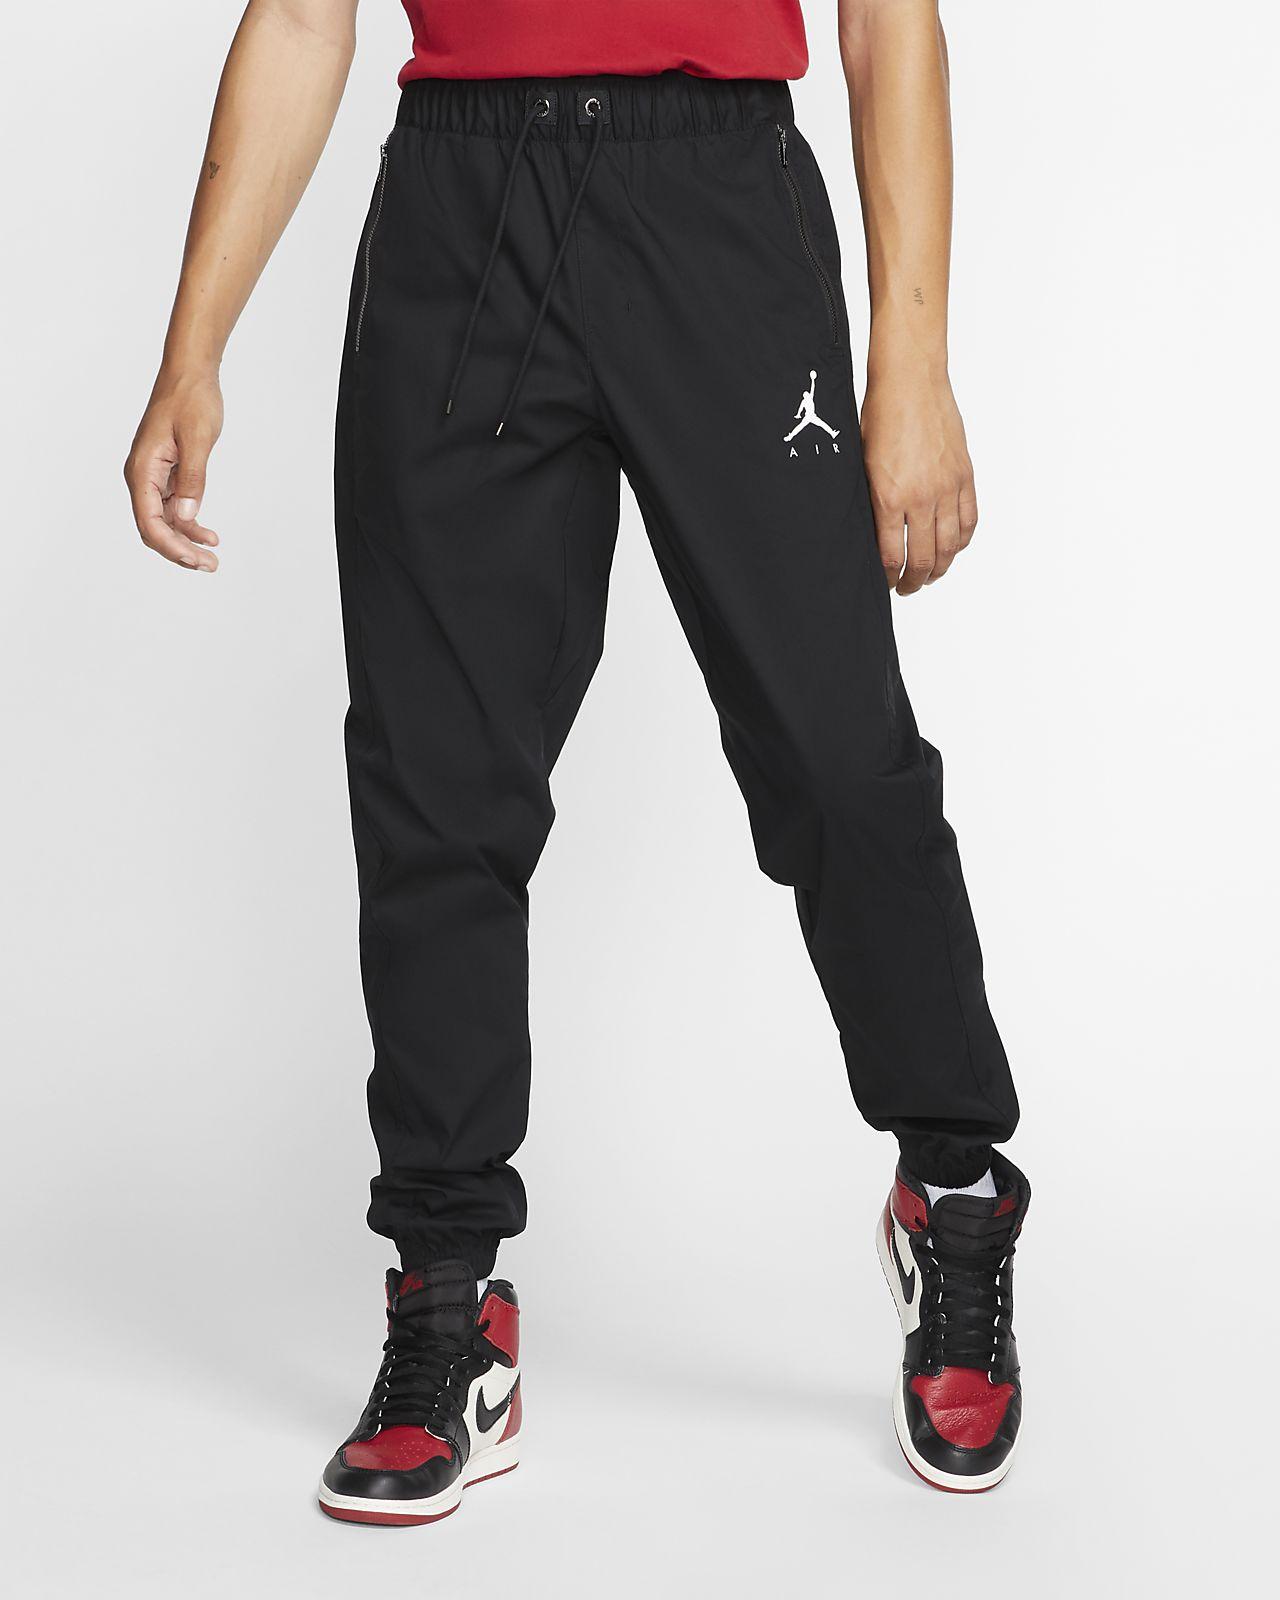 Jordan Jumpman Men's Woven Pants